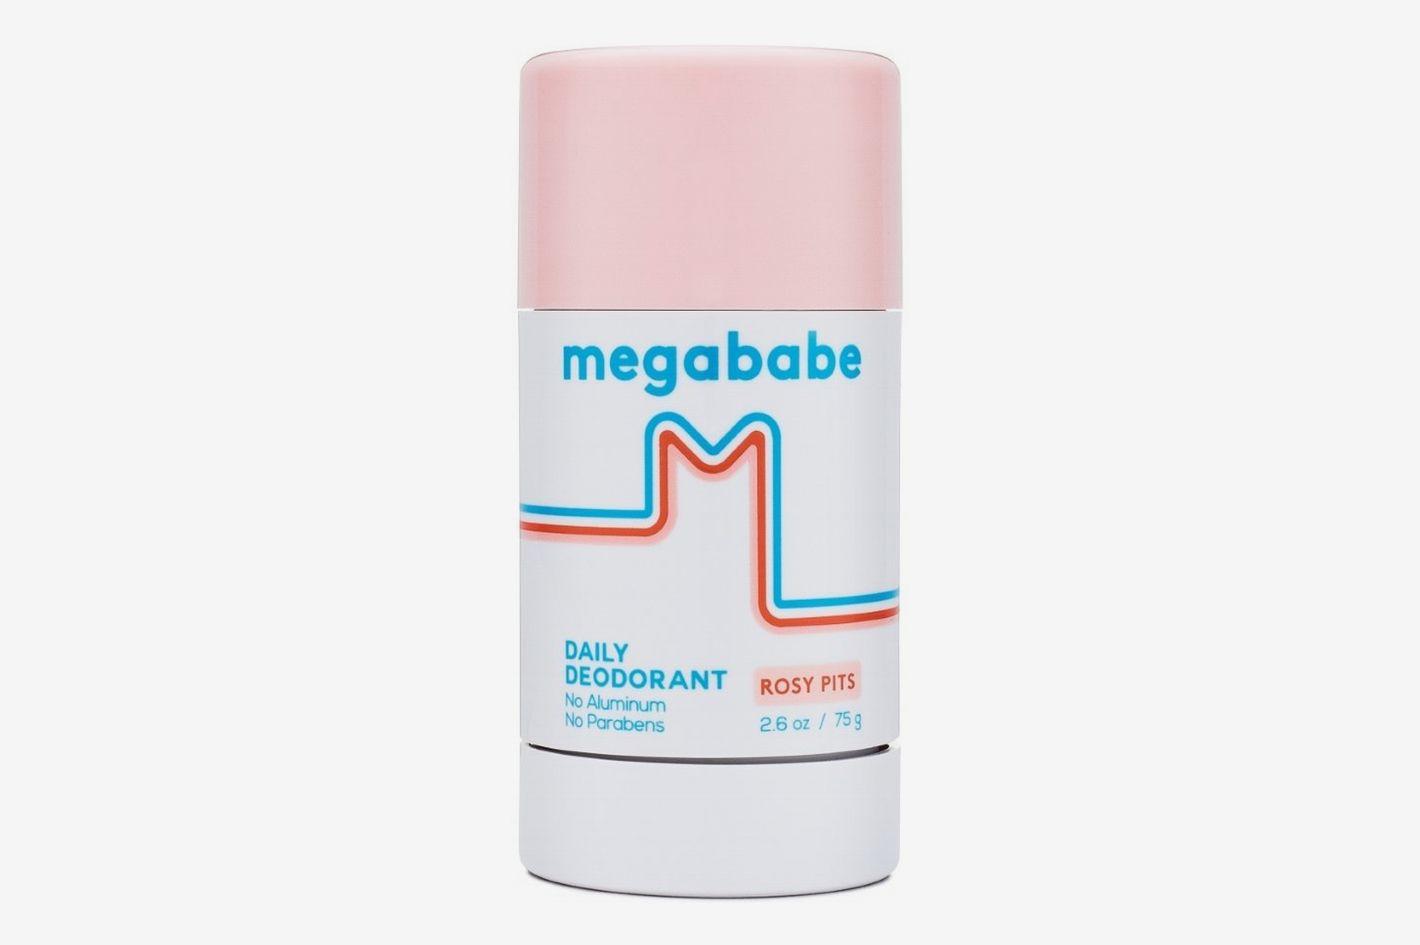 Megababe Rosy Pits Natural Deodorant